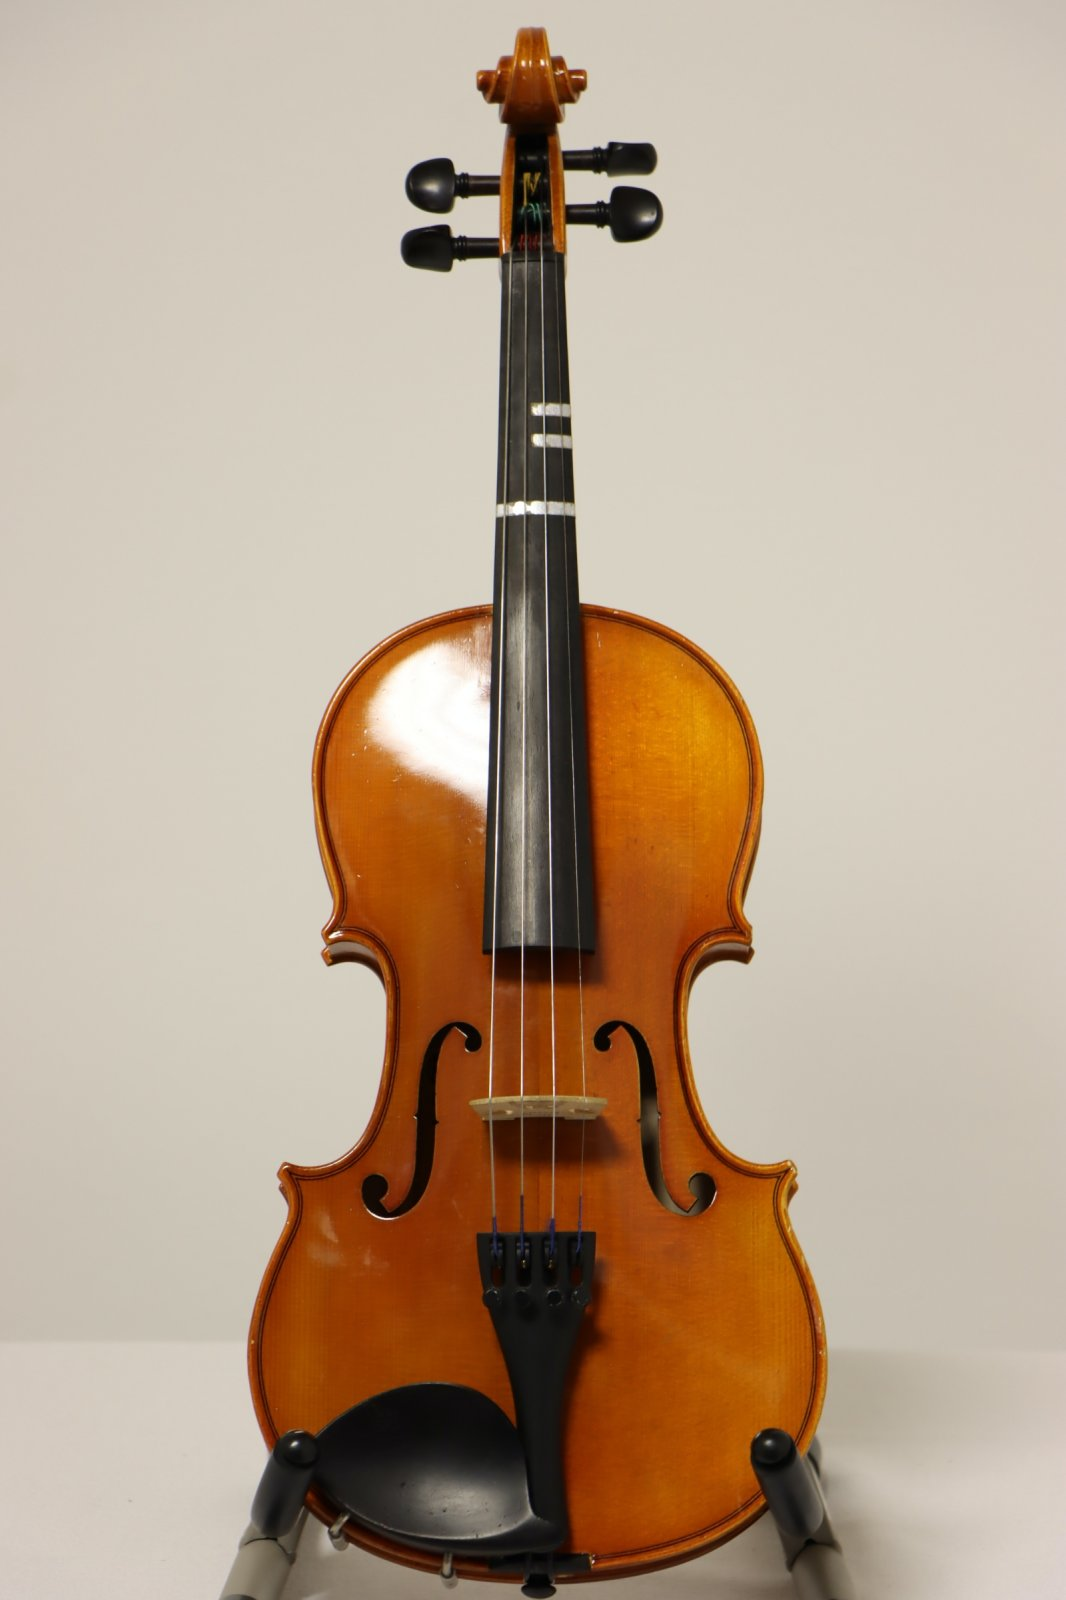 USED Eastman 3/4 Violin Outfit with Bow, Kun Shoulder Rest  & Hard Case